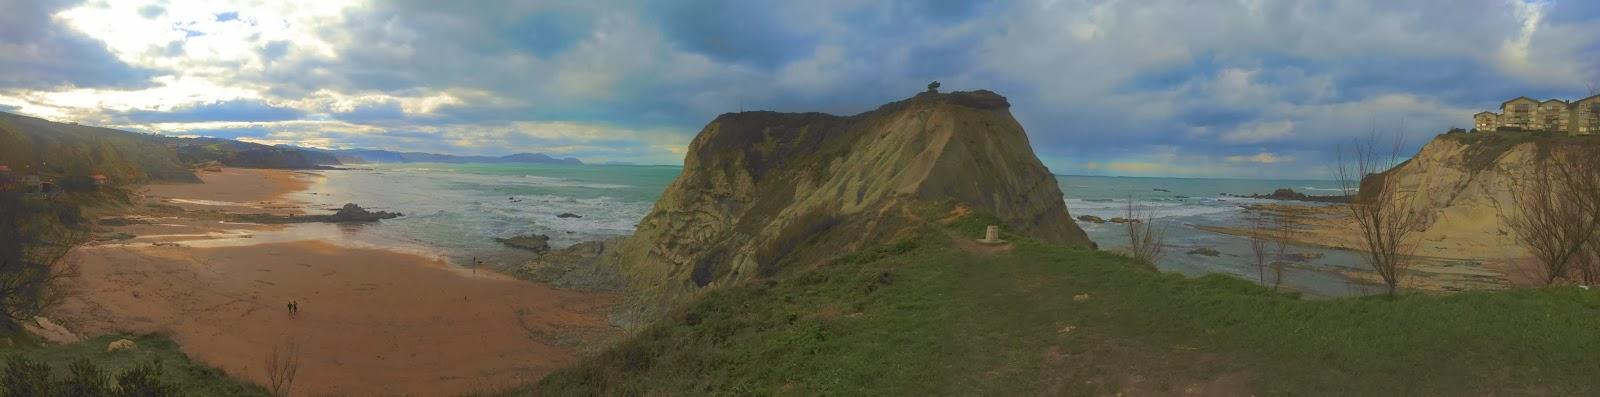 panoramica playa sopelana febrero